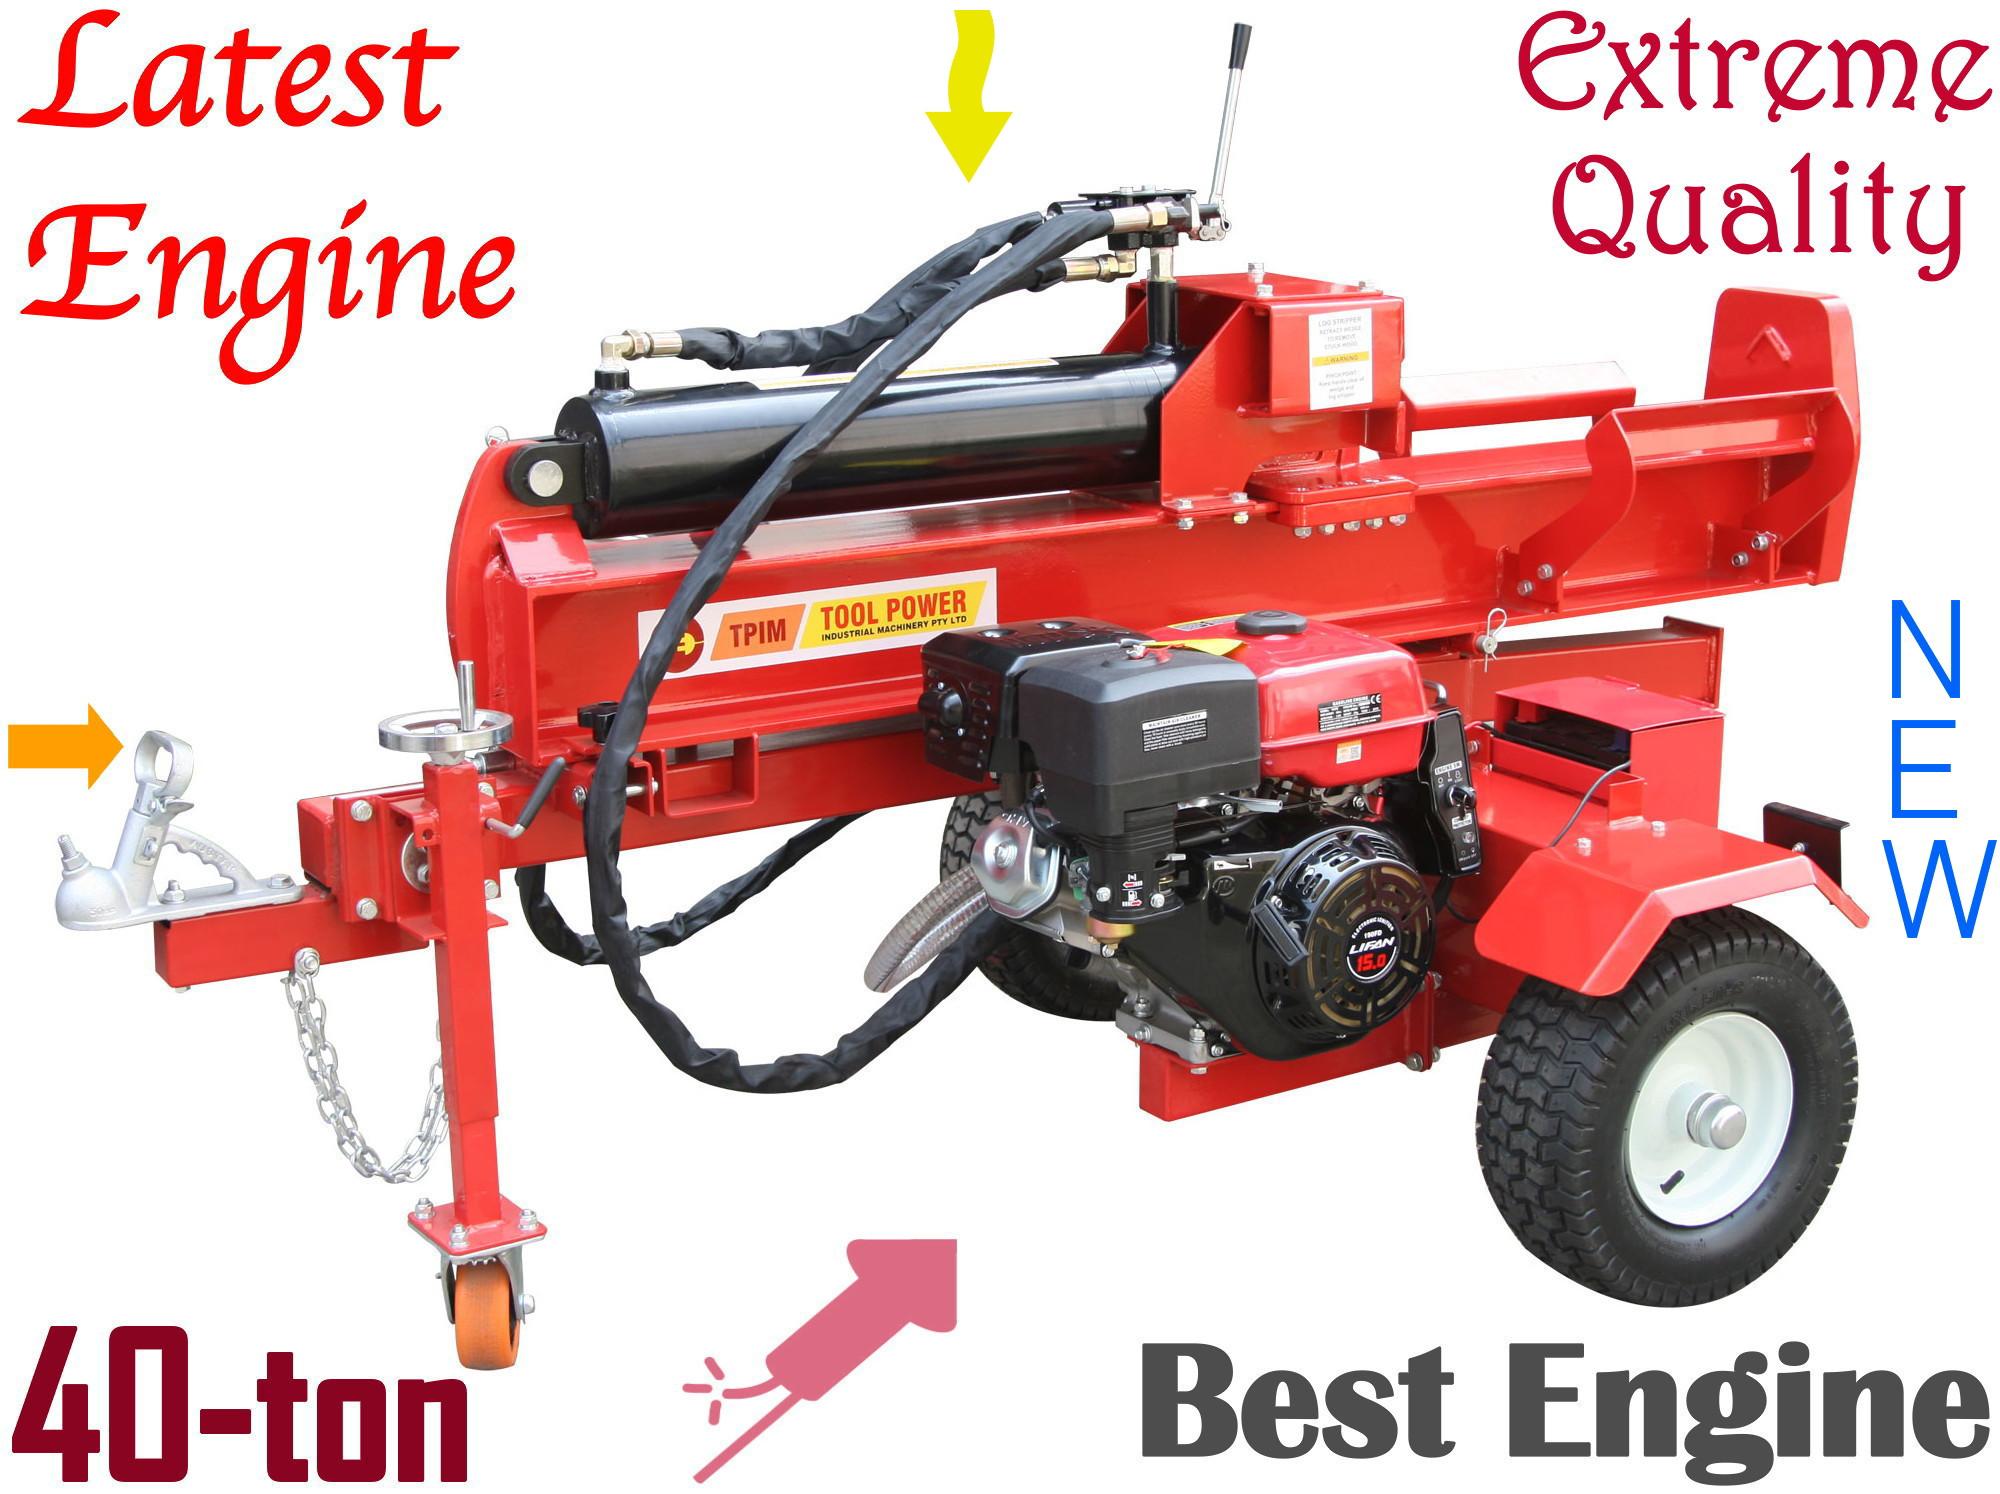 2a6b45f428b6 Log splitter TOOL POWER 40-ton, 15-hp Electric Start - TPIM